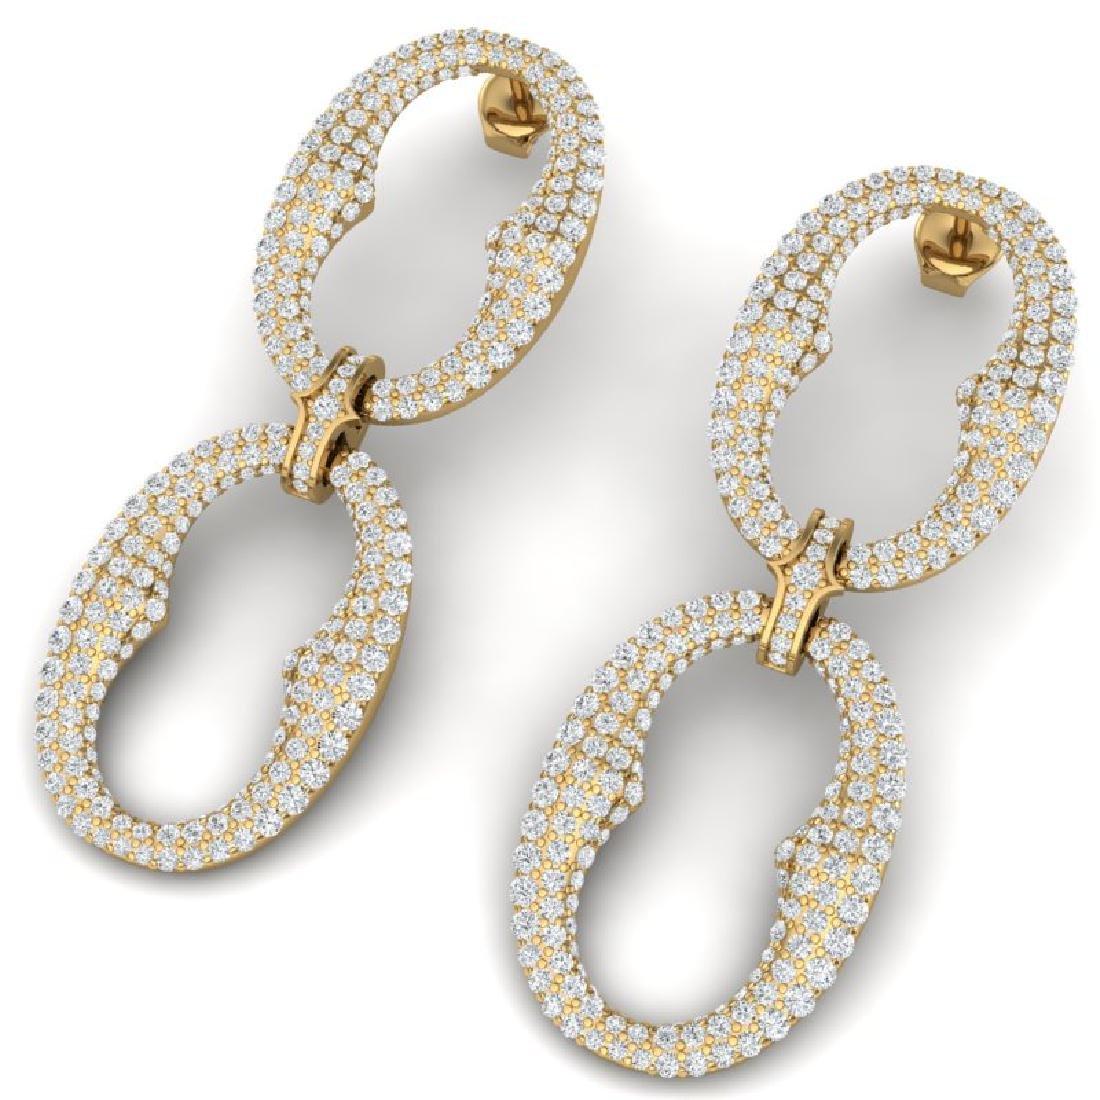 7 CTW Certified VS/SI Diamond Earrings 18K Yellow Gold